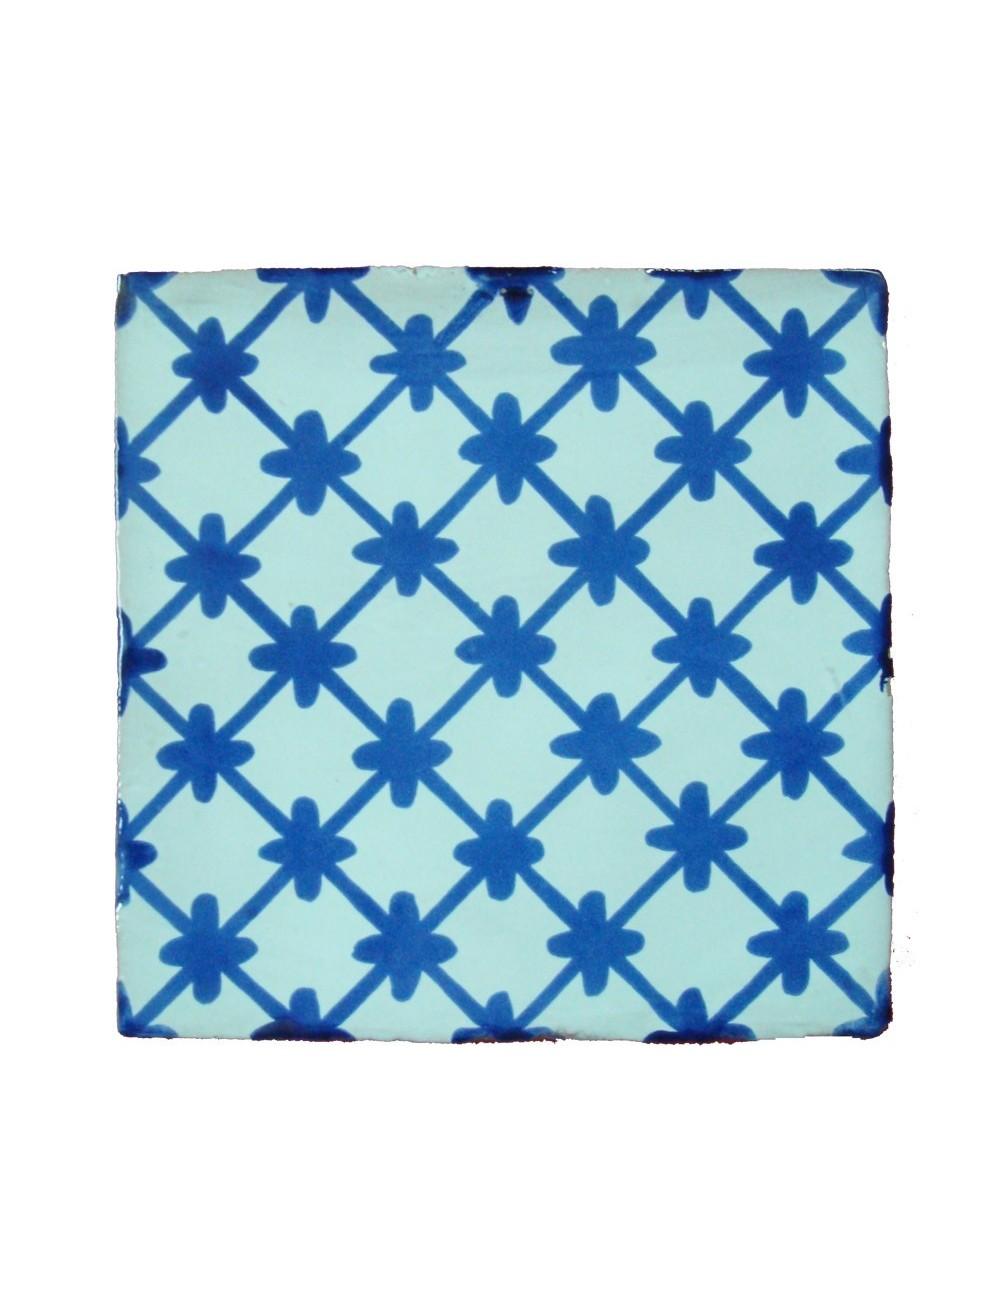 Az 15x15 h1511 artesan a sevilla - Azulejo blanco 15x15 ...